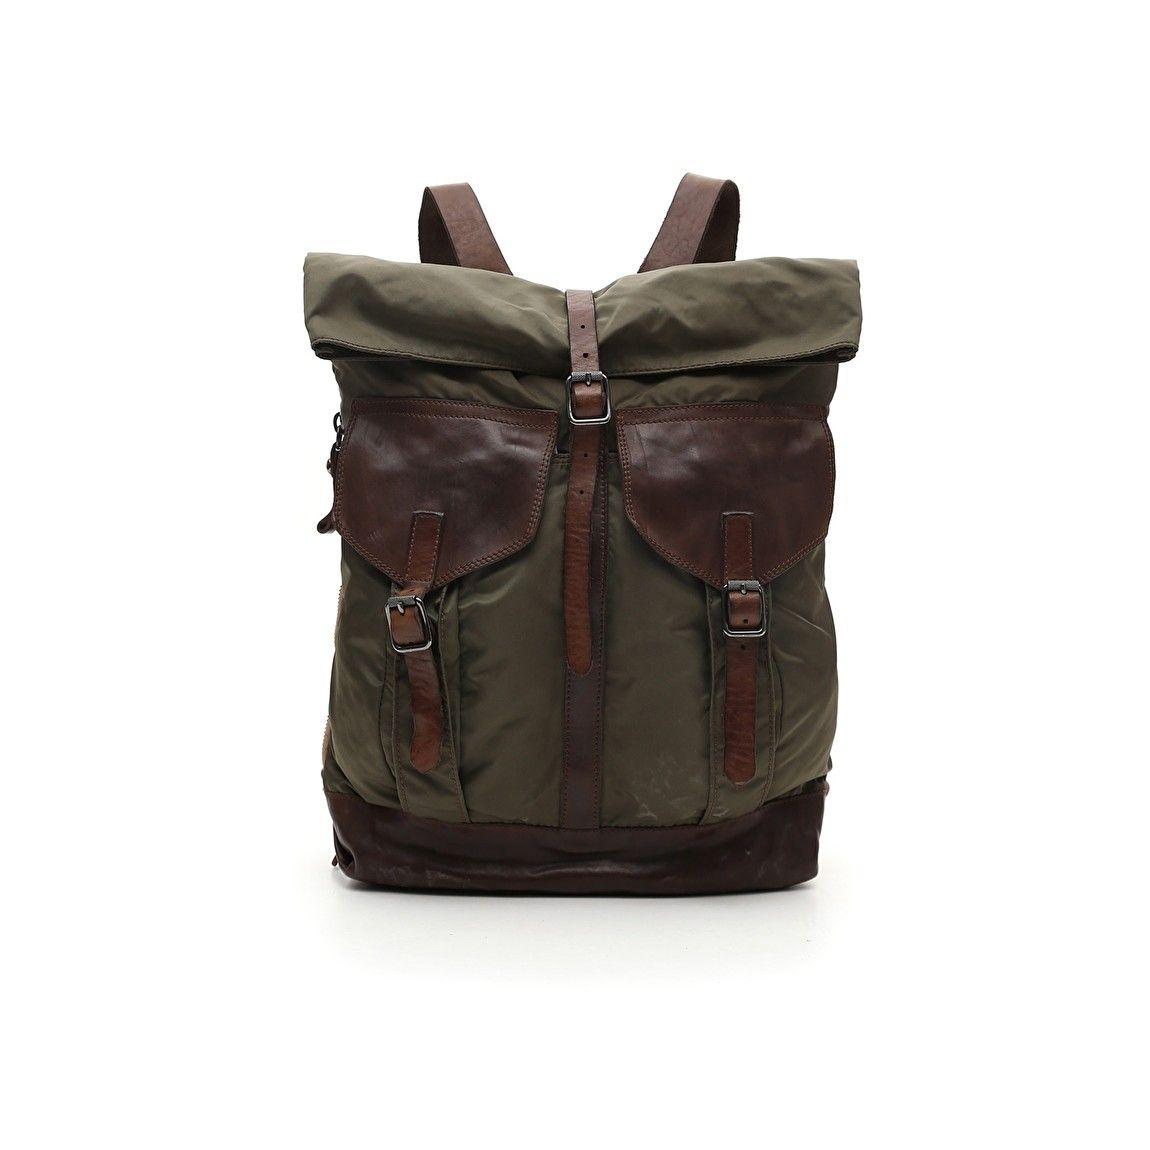 CAMPOMAGGI - Rucksack - Backpack - Military / Brown